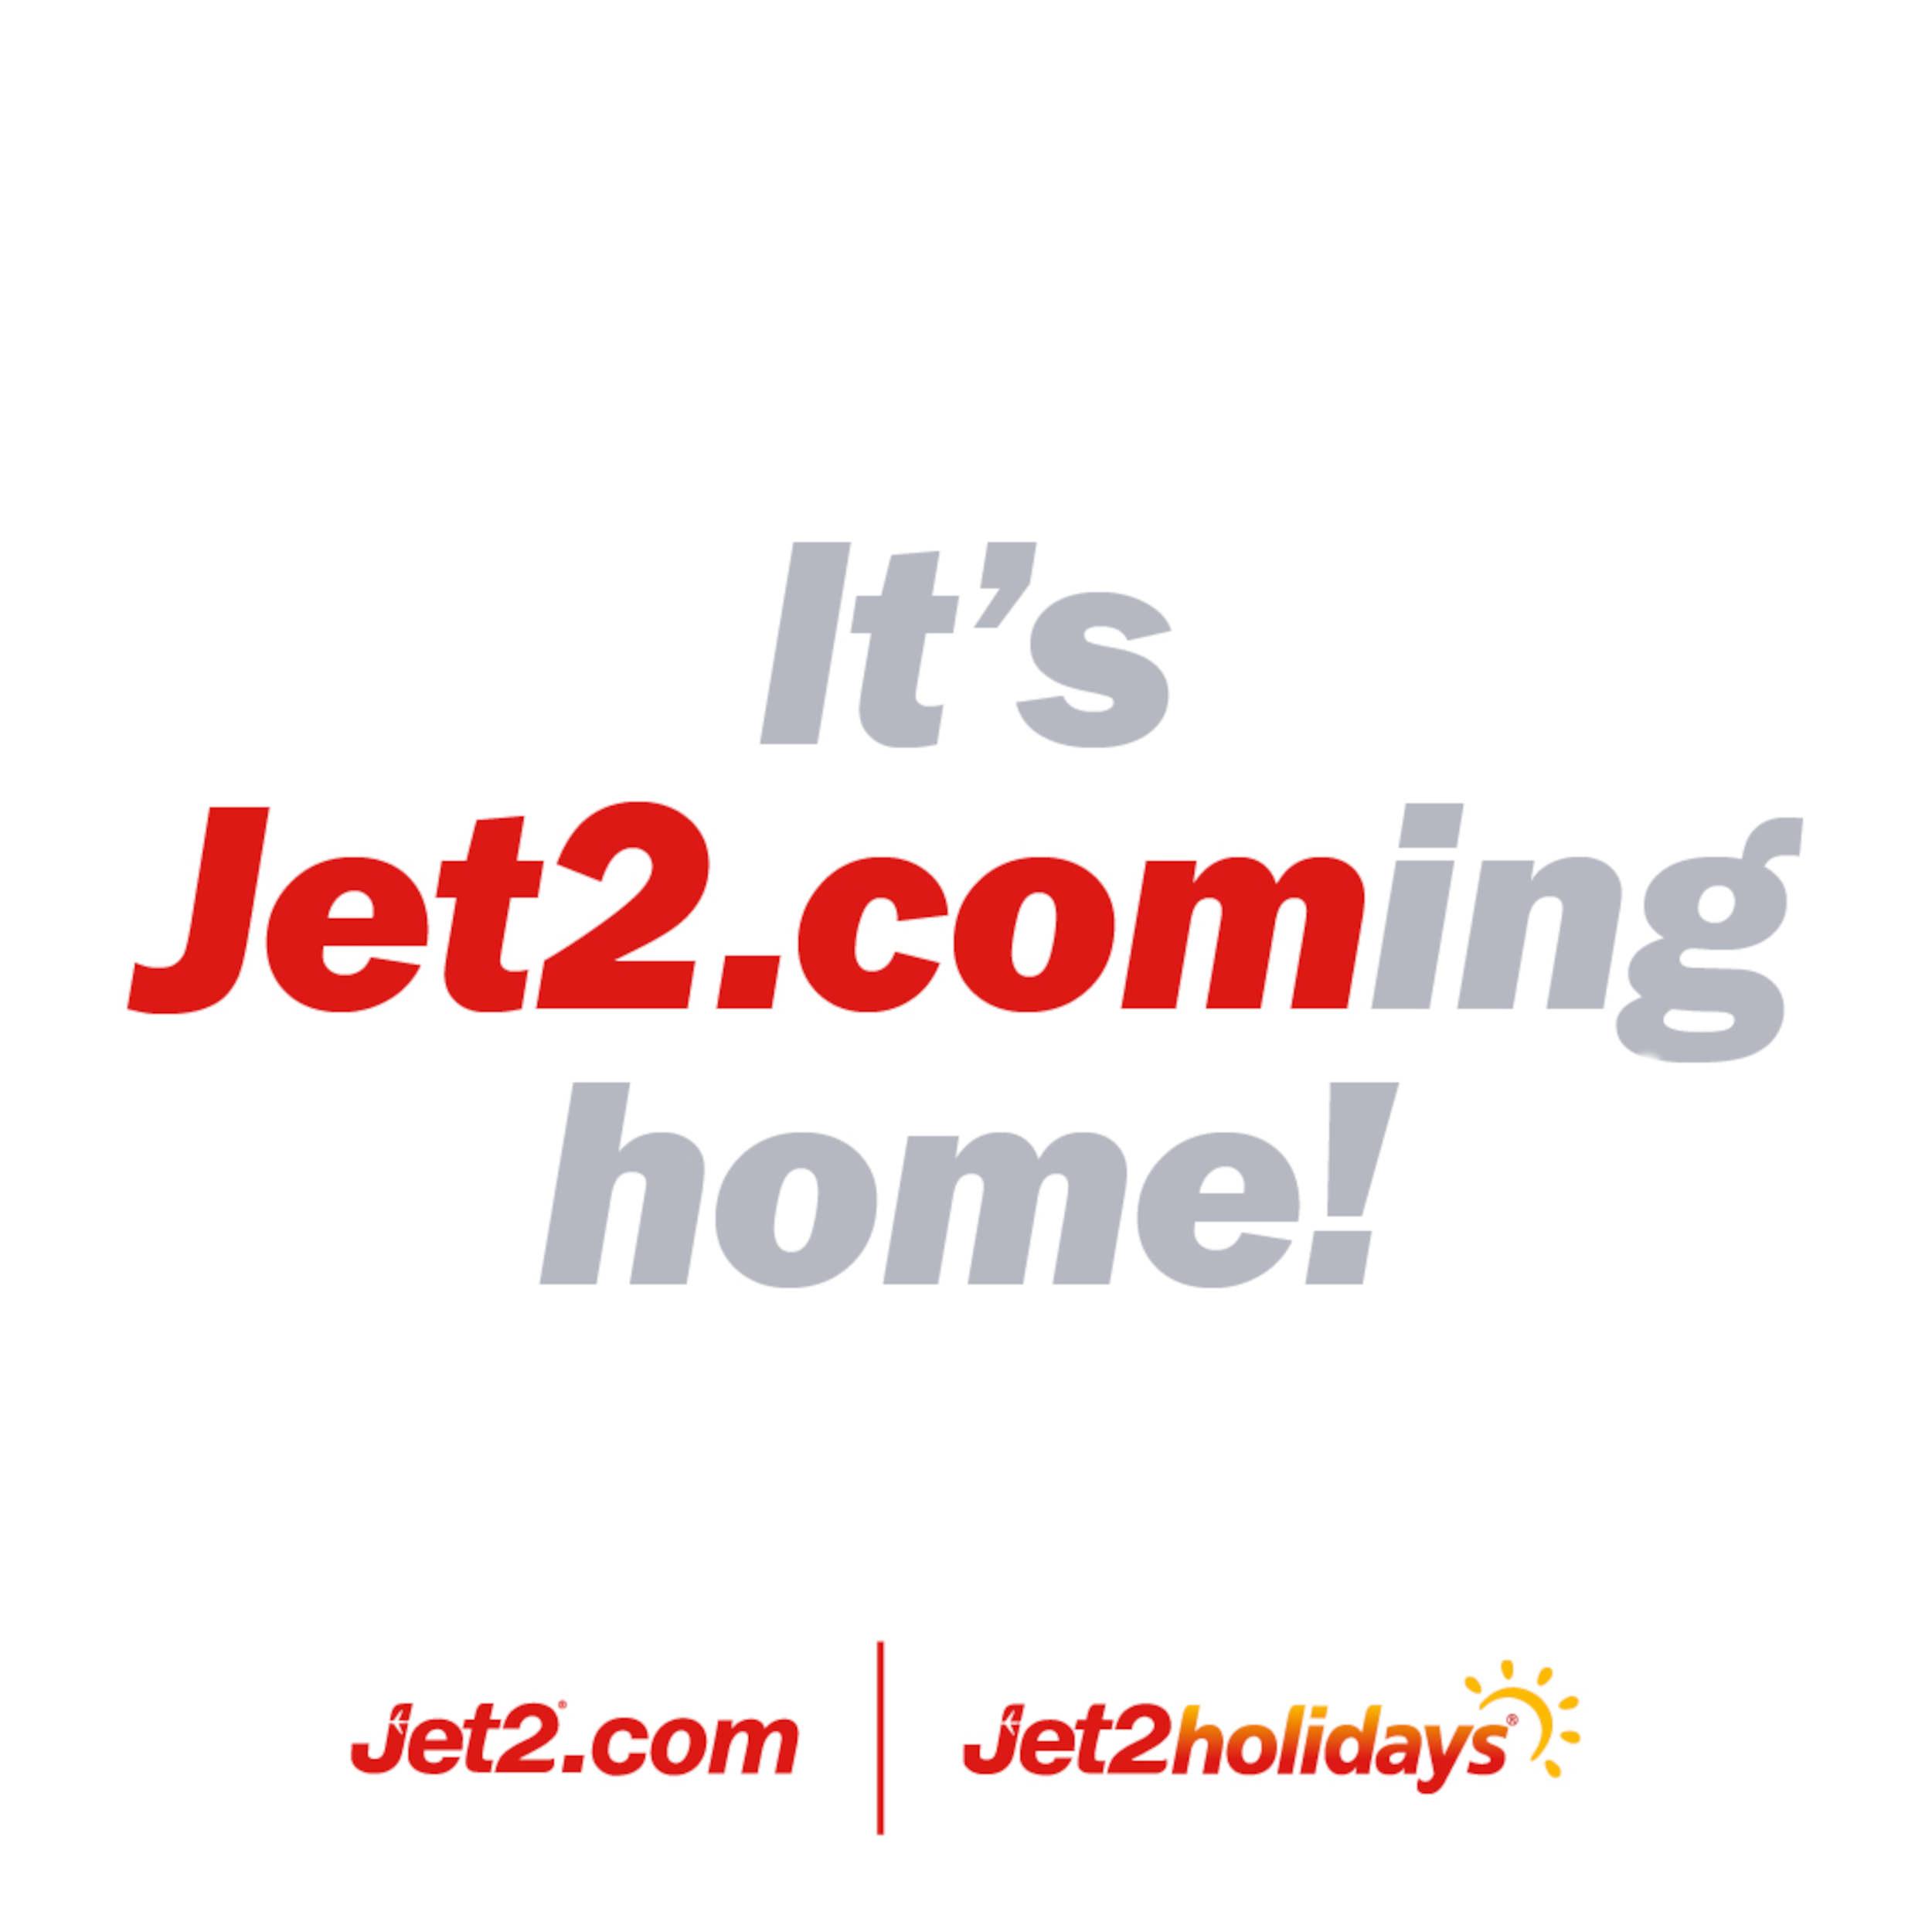 jet2 it's jet2.coming home - consumer news UK